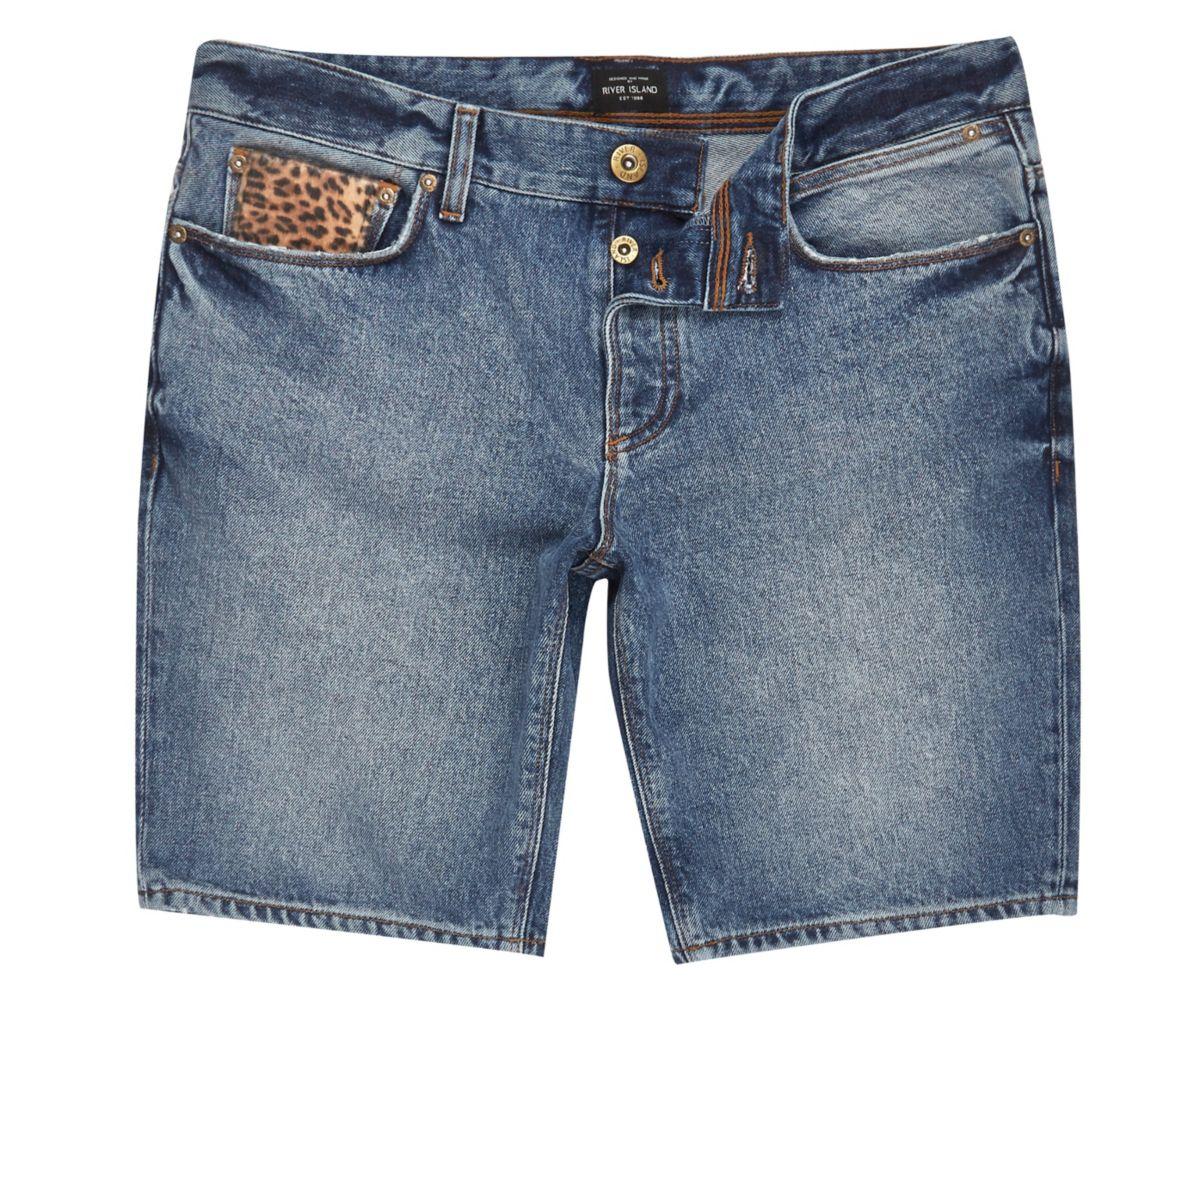 Blauwe skinny-fit short met opzetstuk met luidpaardprint